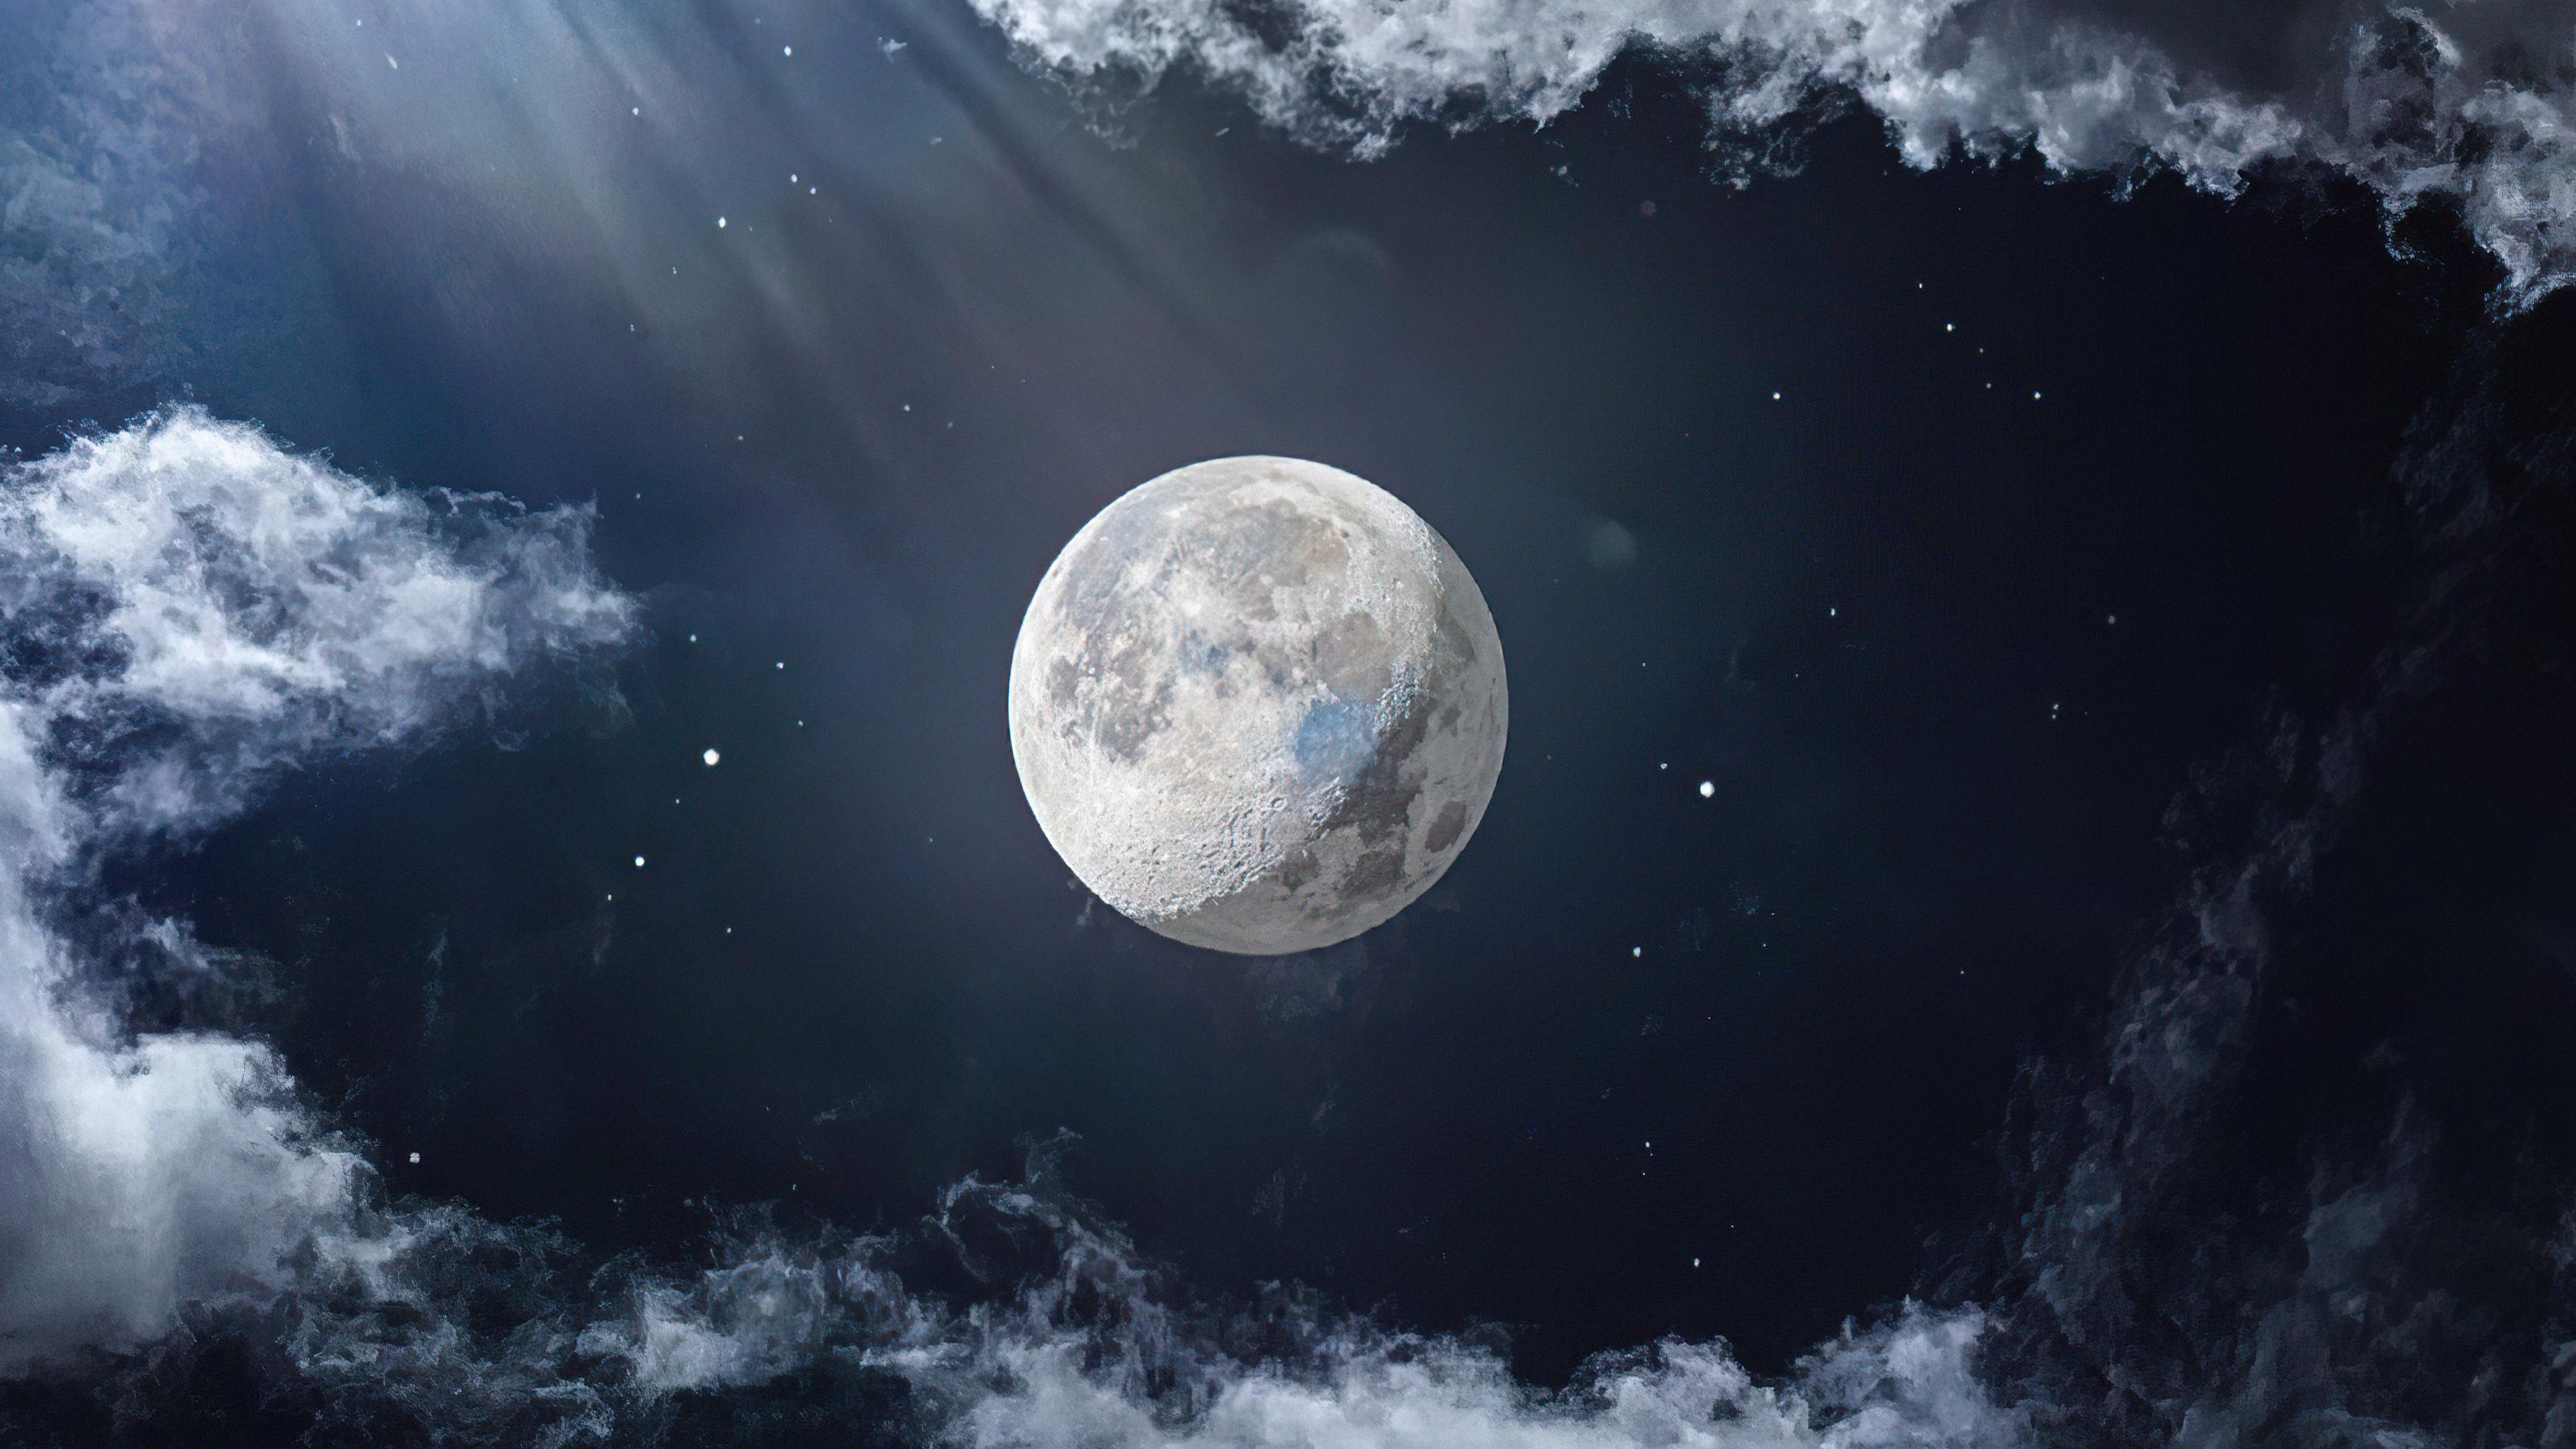 Fondos de pantalla La luna junto a nubes